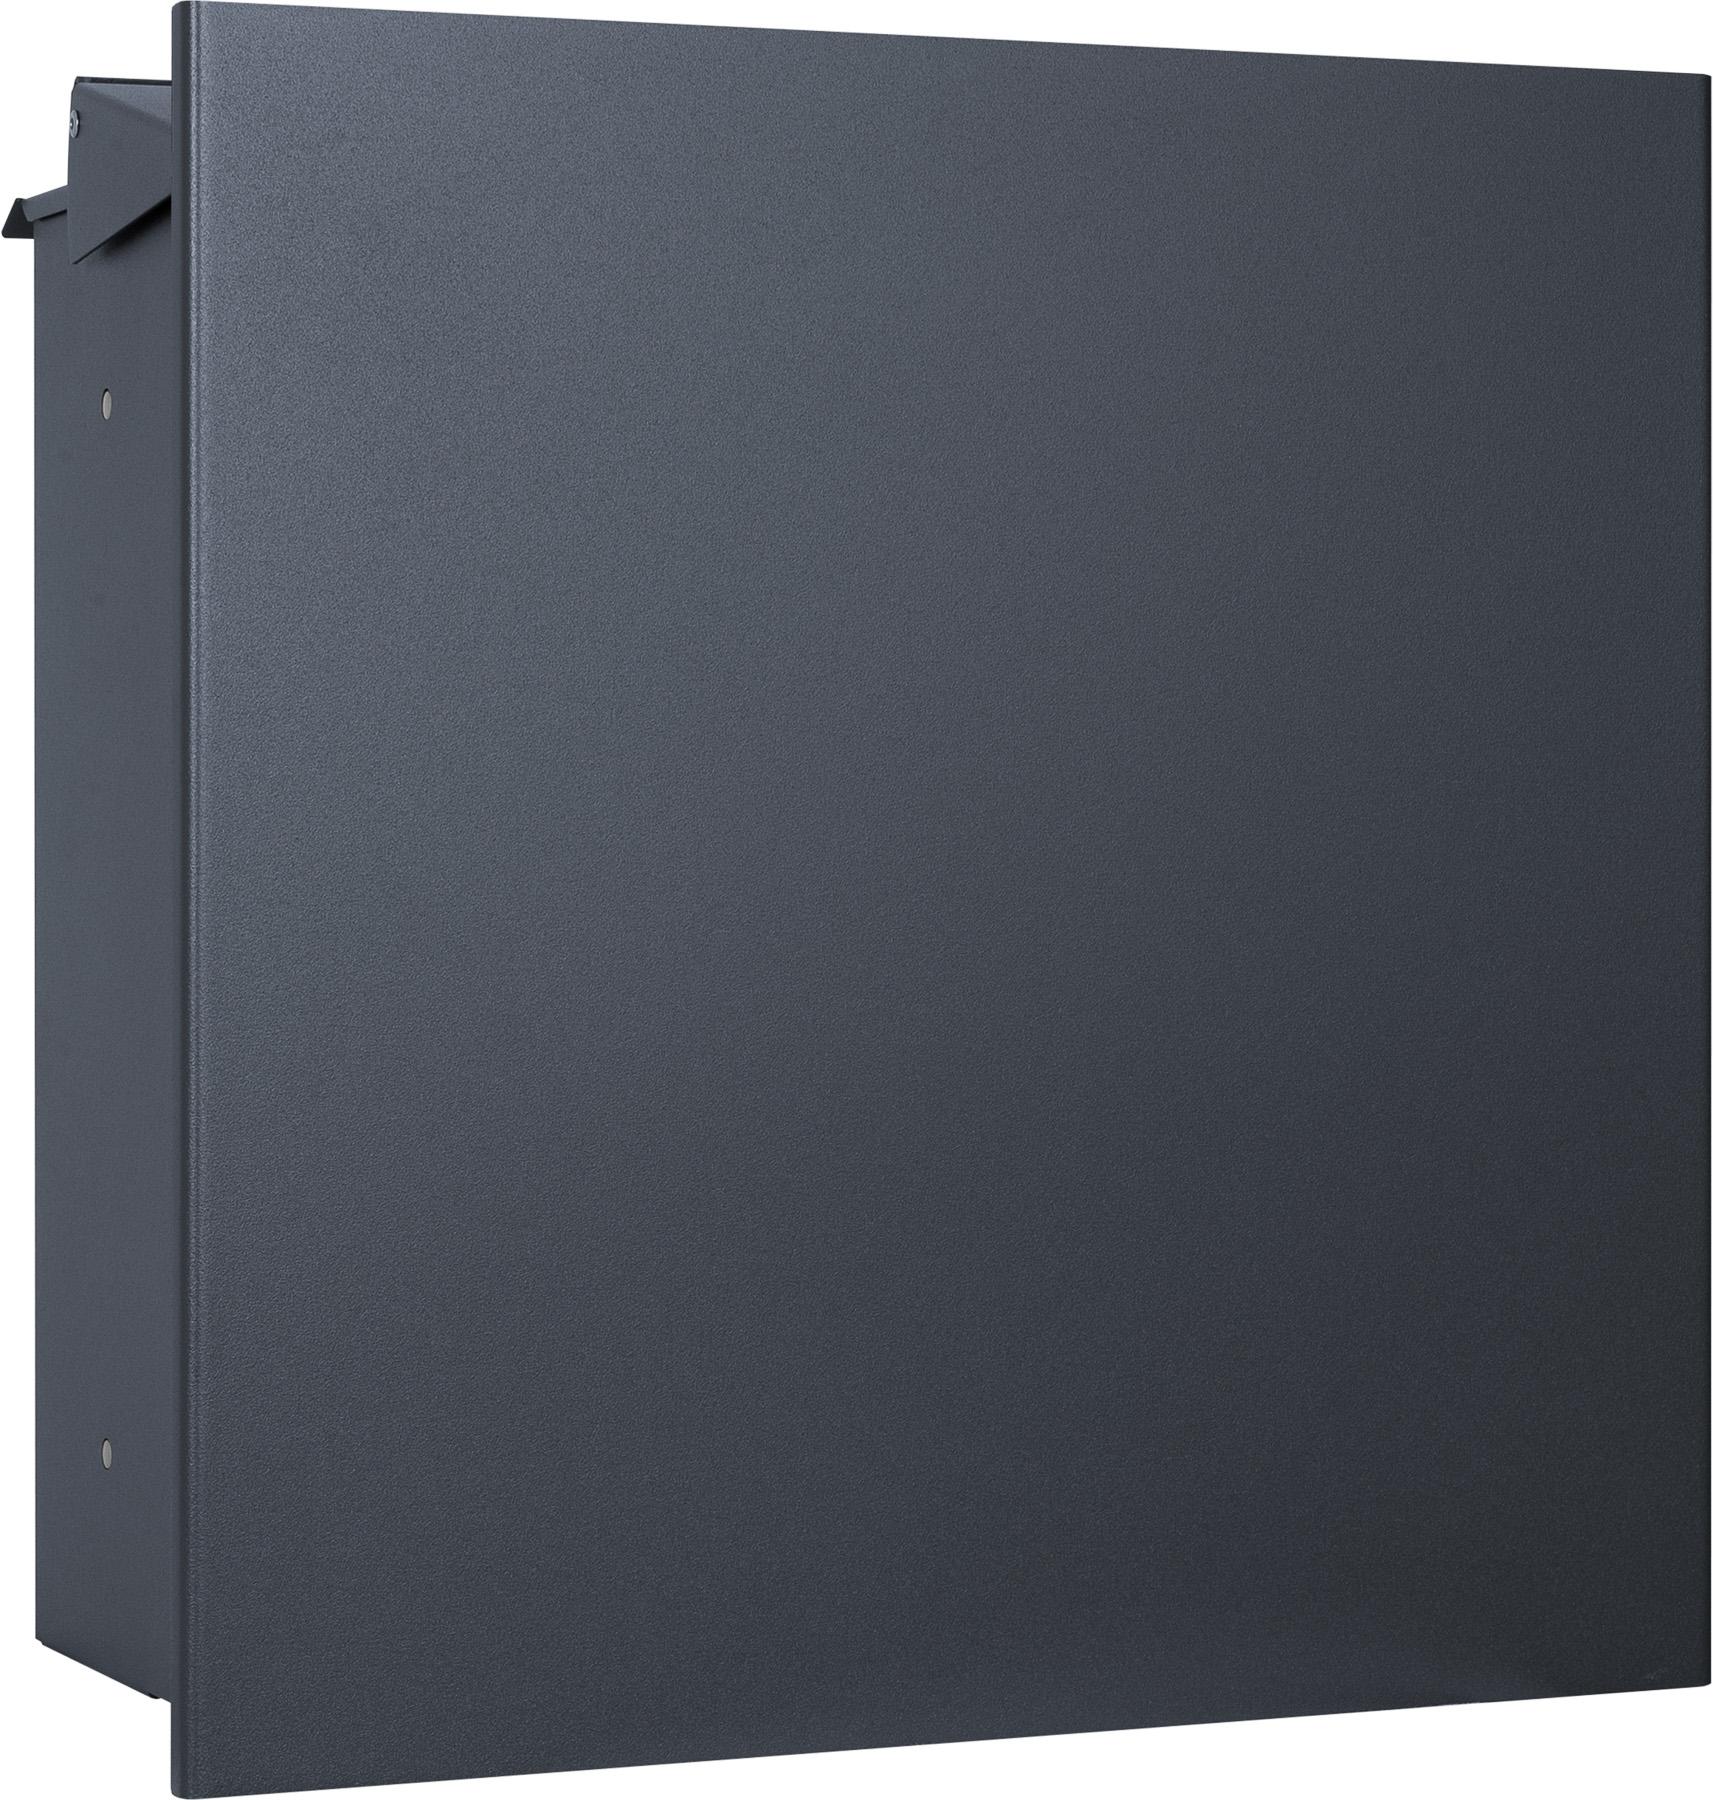 mocavi zbox 111 zaunbriefkasten anthrazit ral 7016 eingang. Black Bedroom Furniture Sets. Home Design Ideas